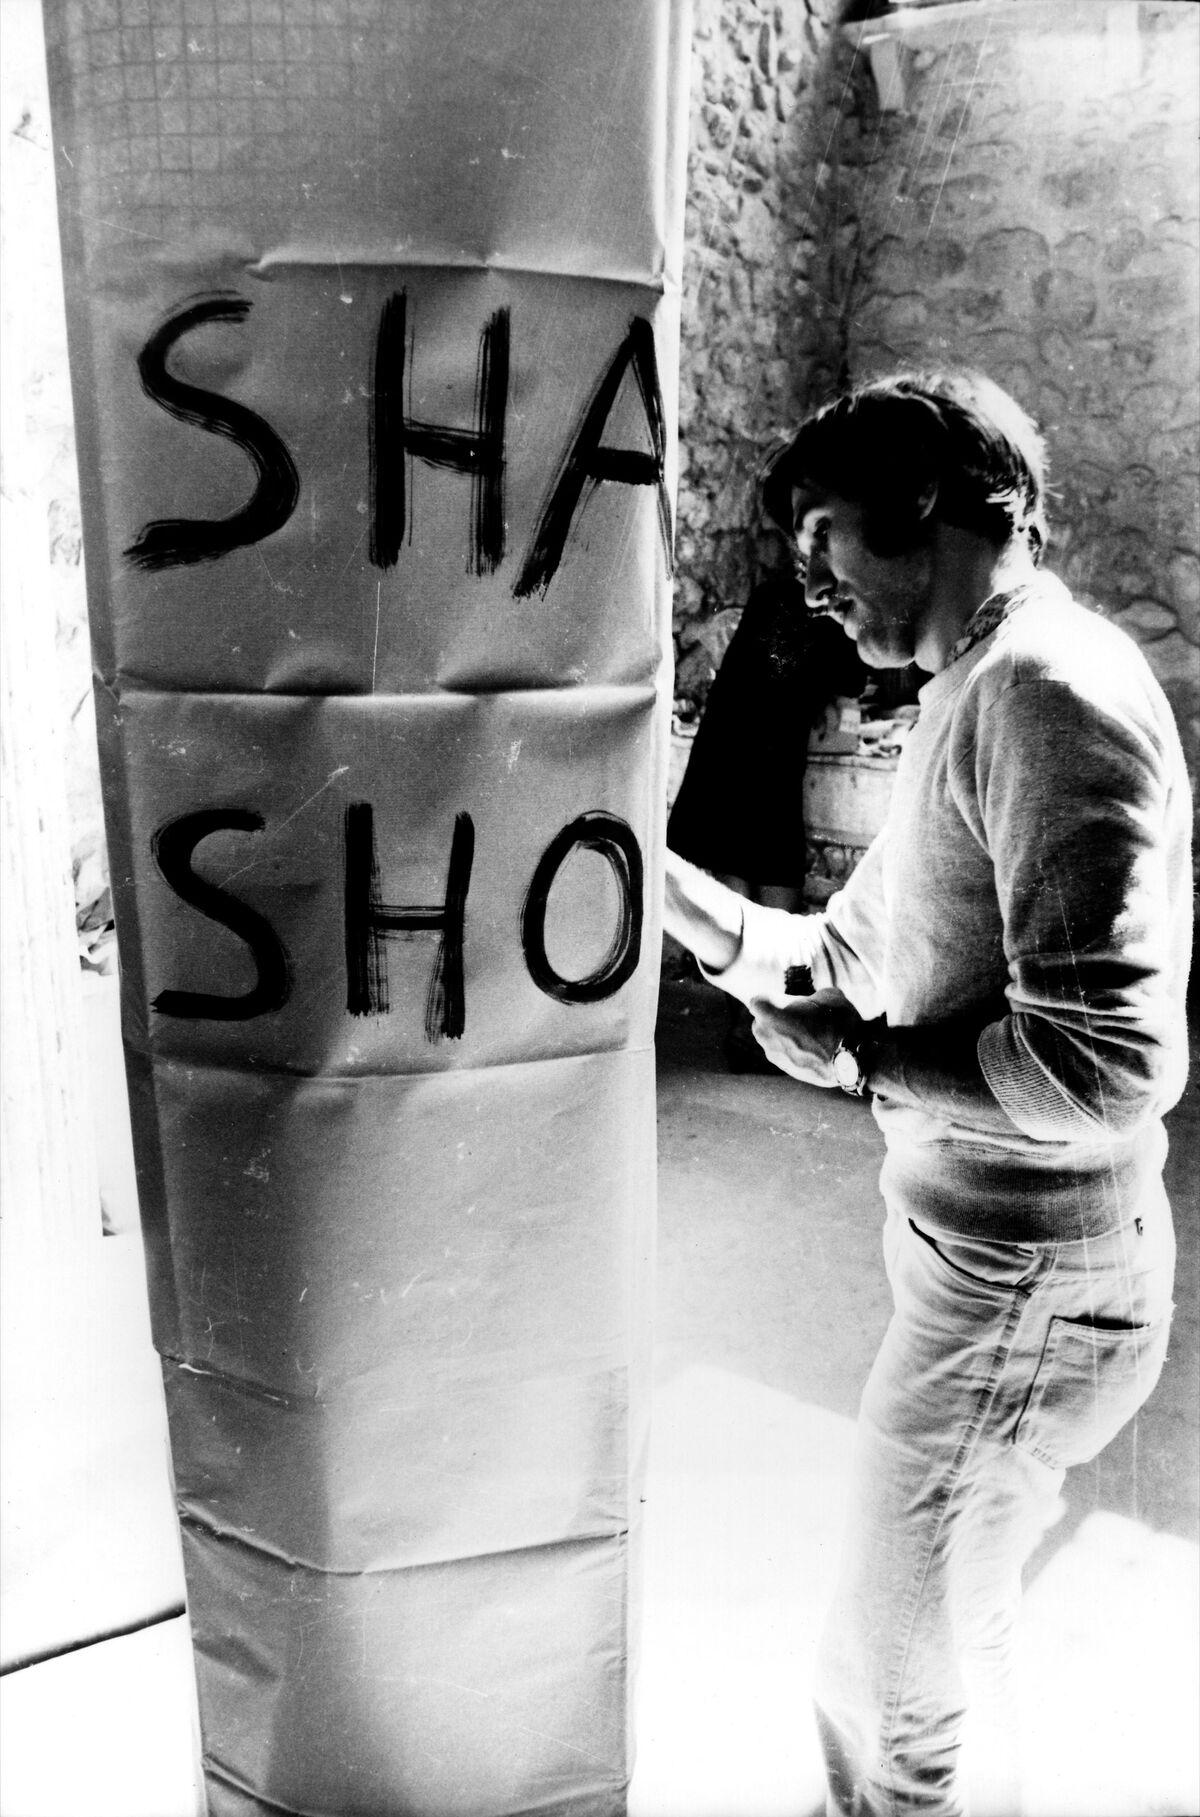 Alighiero Boetti working on Shaman-Showman at Arte Povera, 1968. Photo by Bruno Manconi. Courtesy of Archivo Lia Rumma.